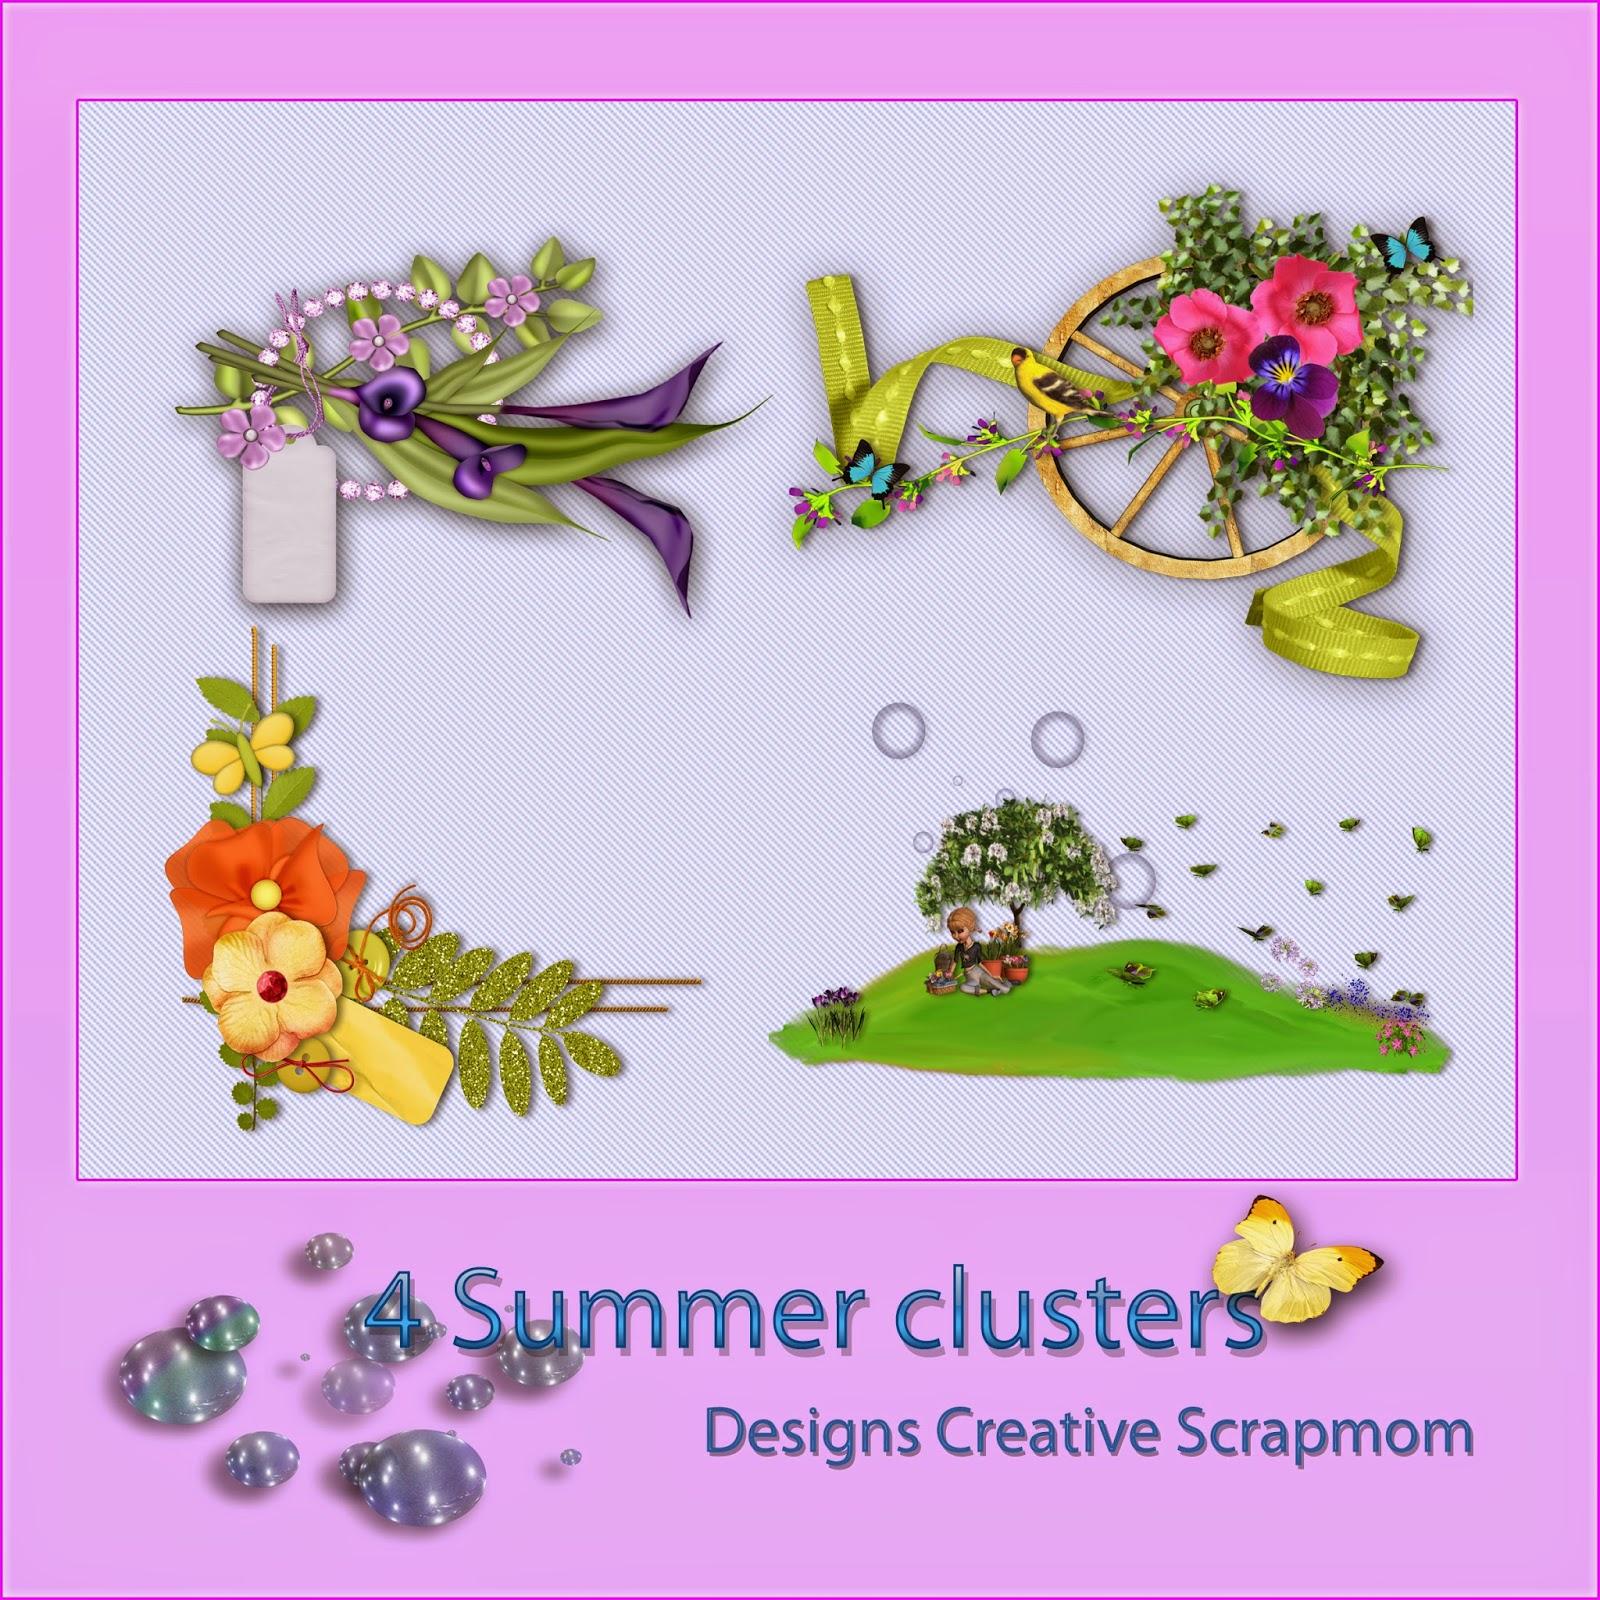 http://2.bp.blogspot.com/-3KibI2mlwYM/U3IXa9j36UI/AAAAAAAAEPk/QSuMxWFLxRw/s1600/4+clusters+preview.jpg